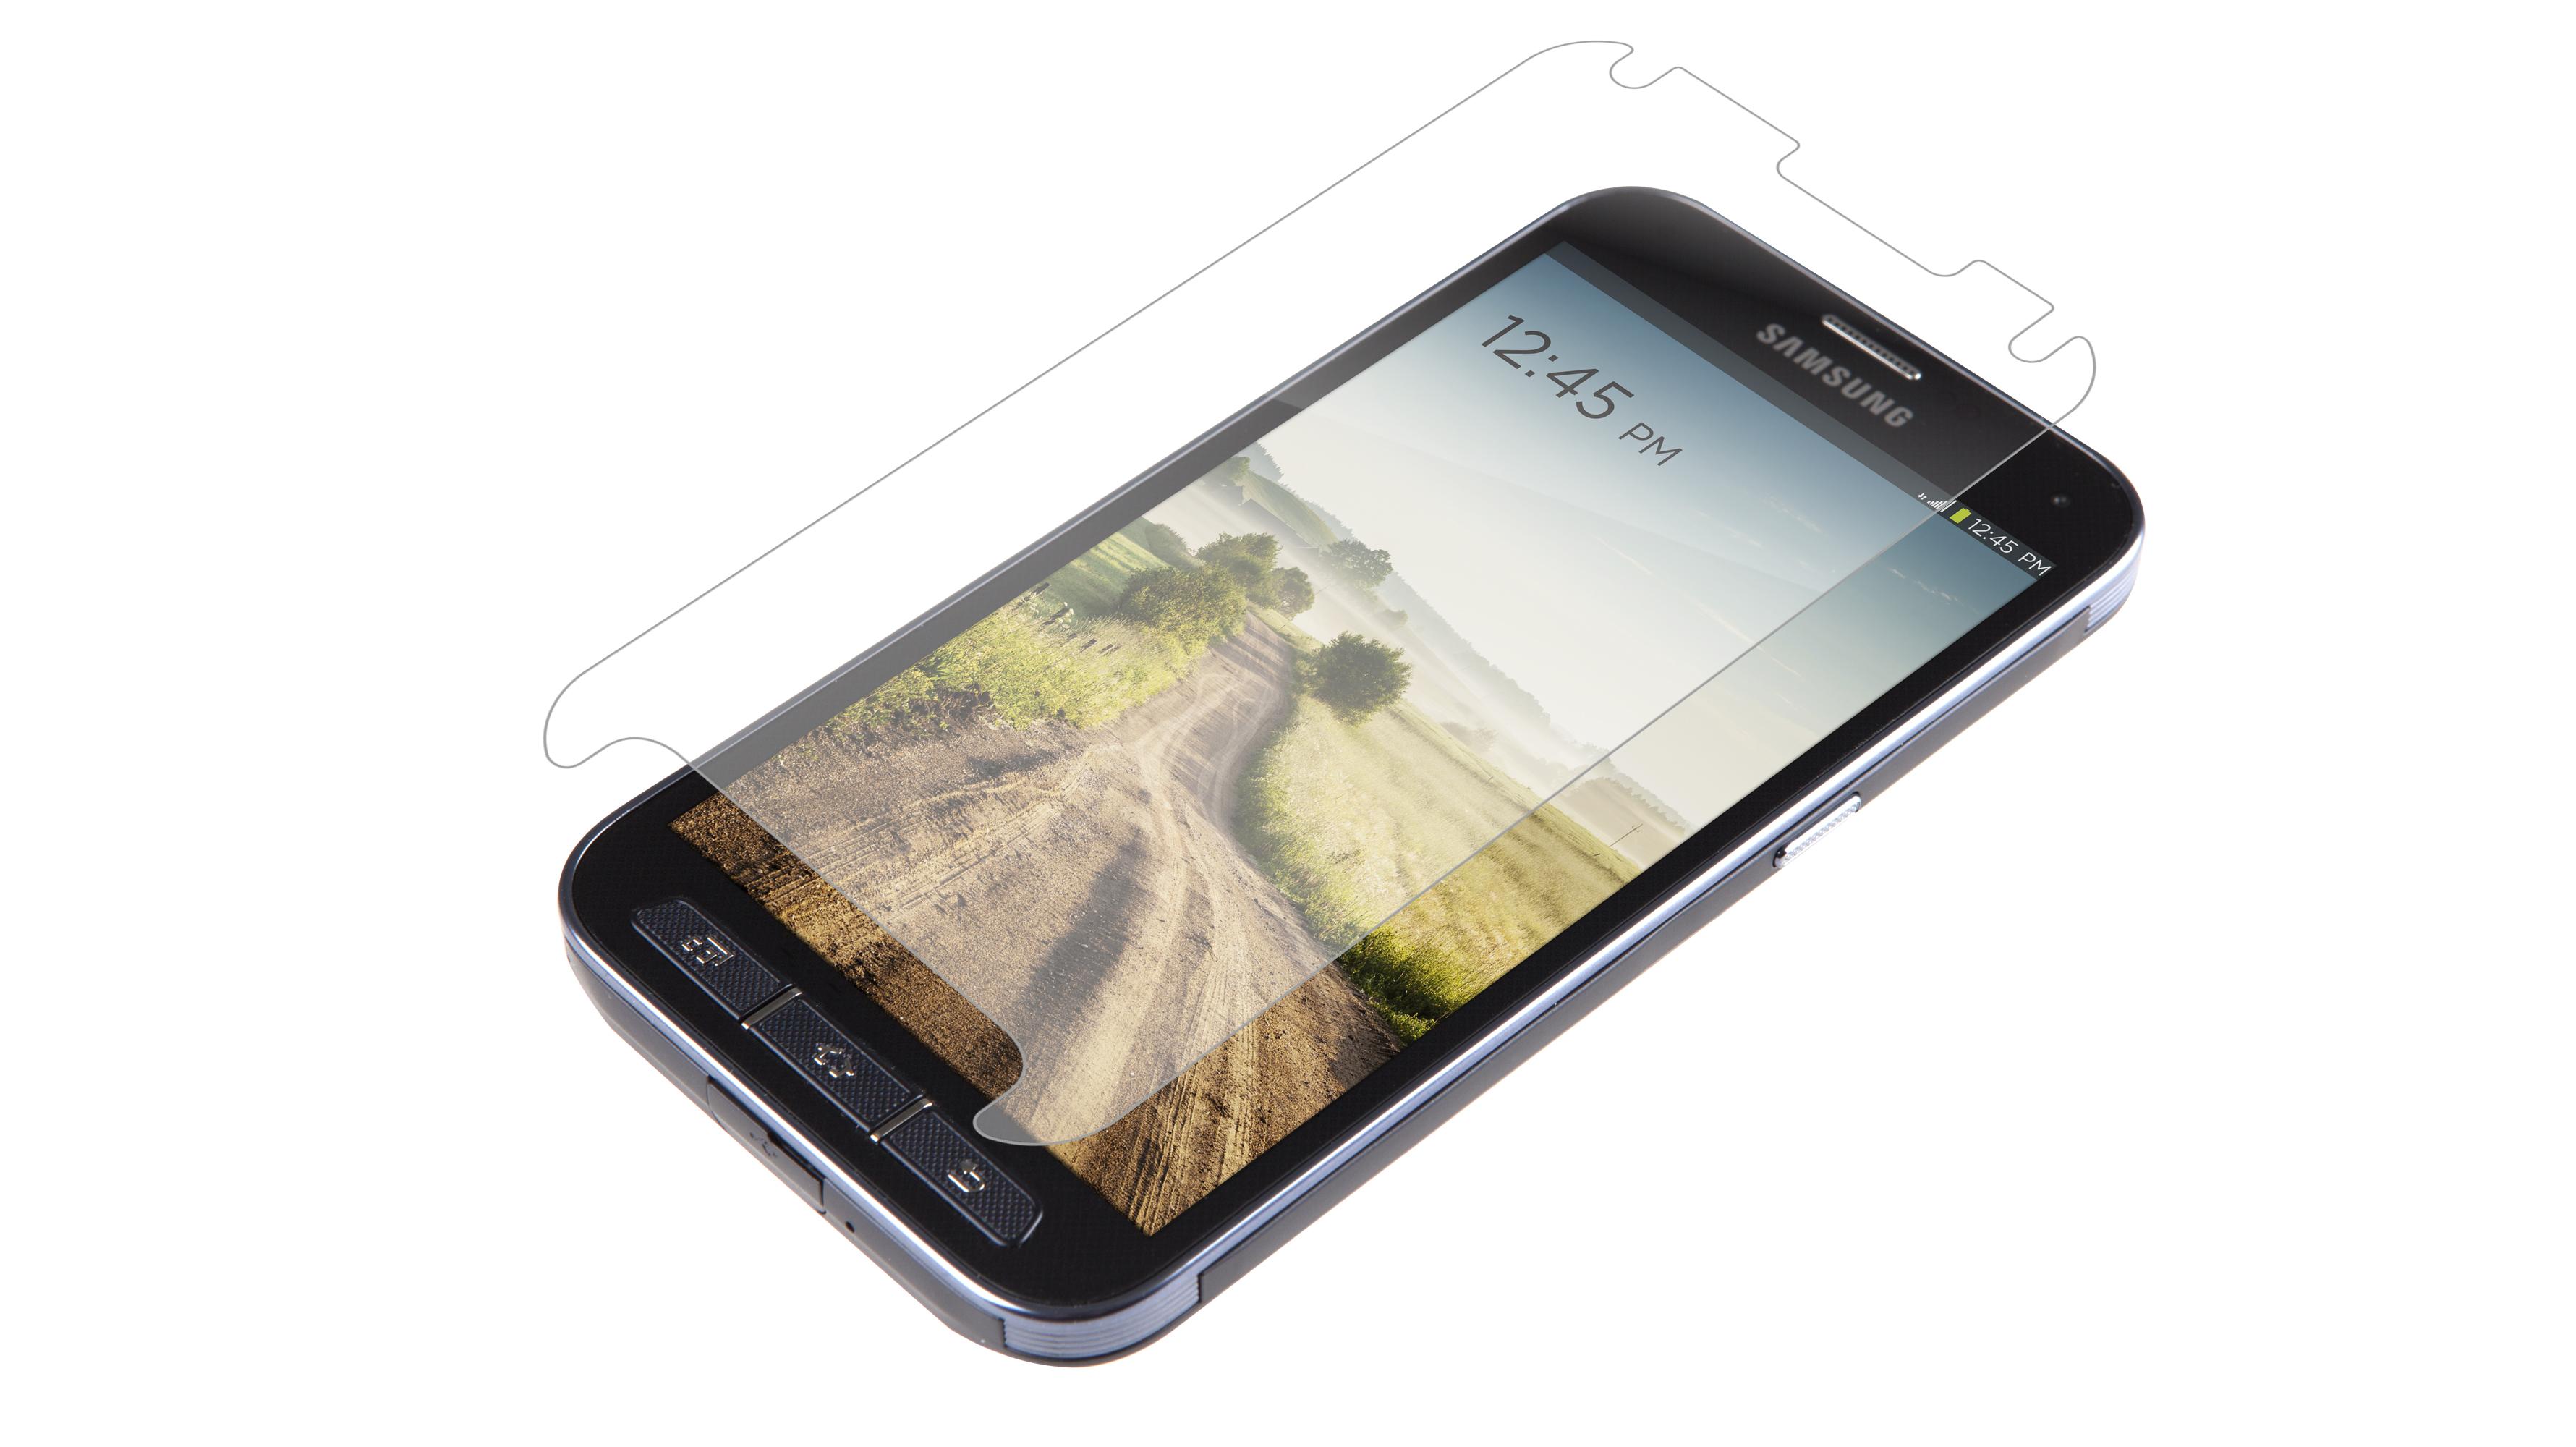 InvisibleShield Original for the Samsung Galaxy S5 Sport